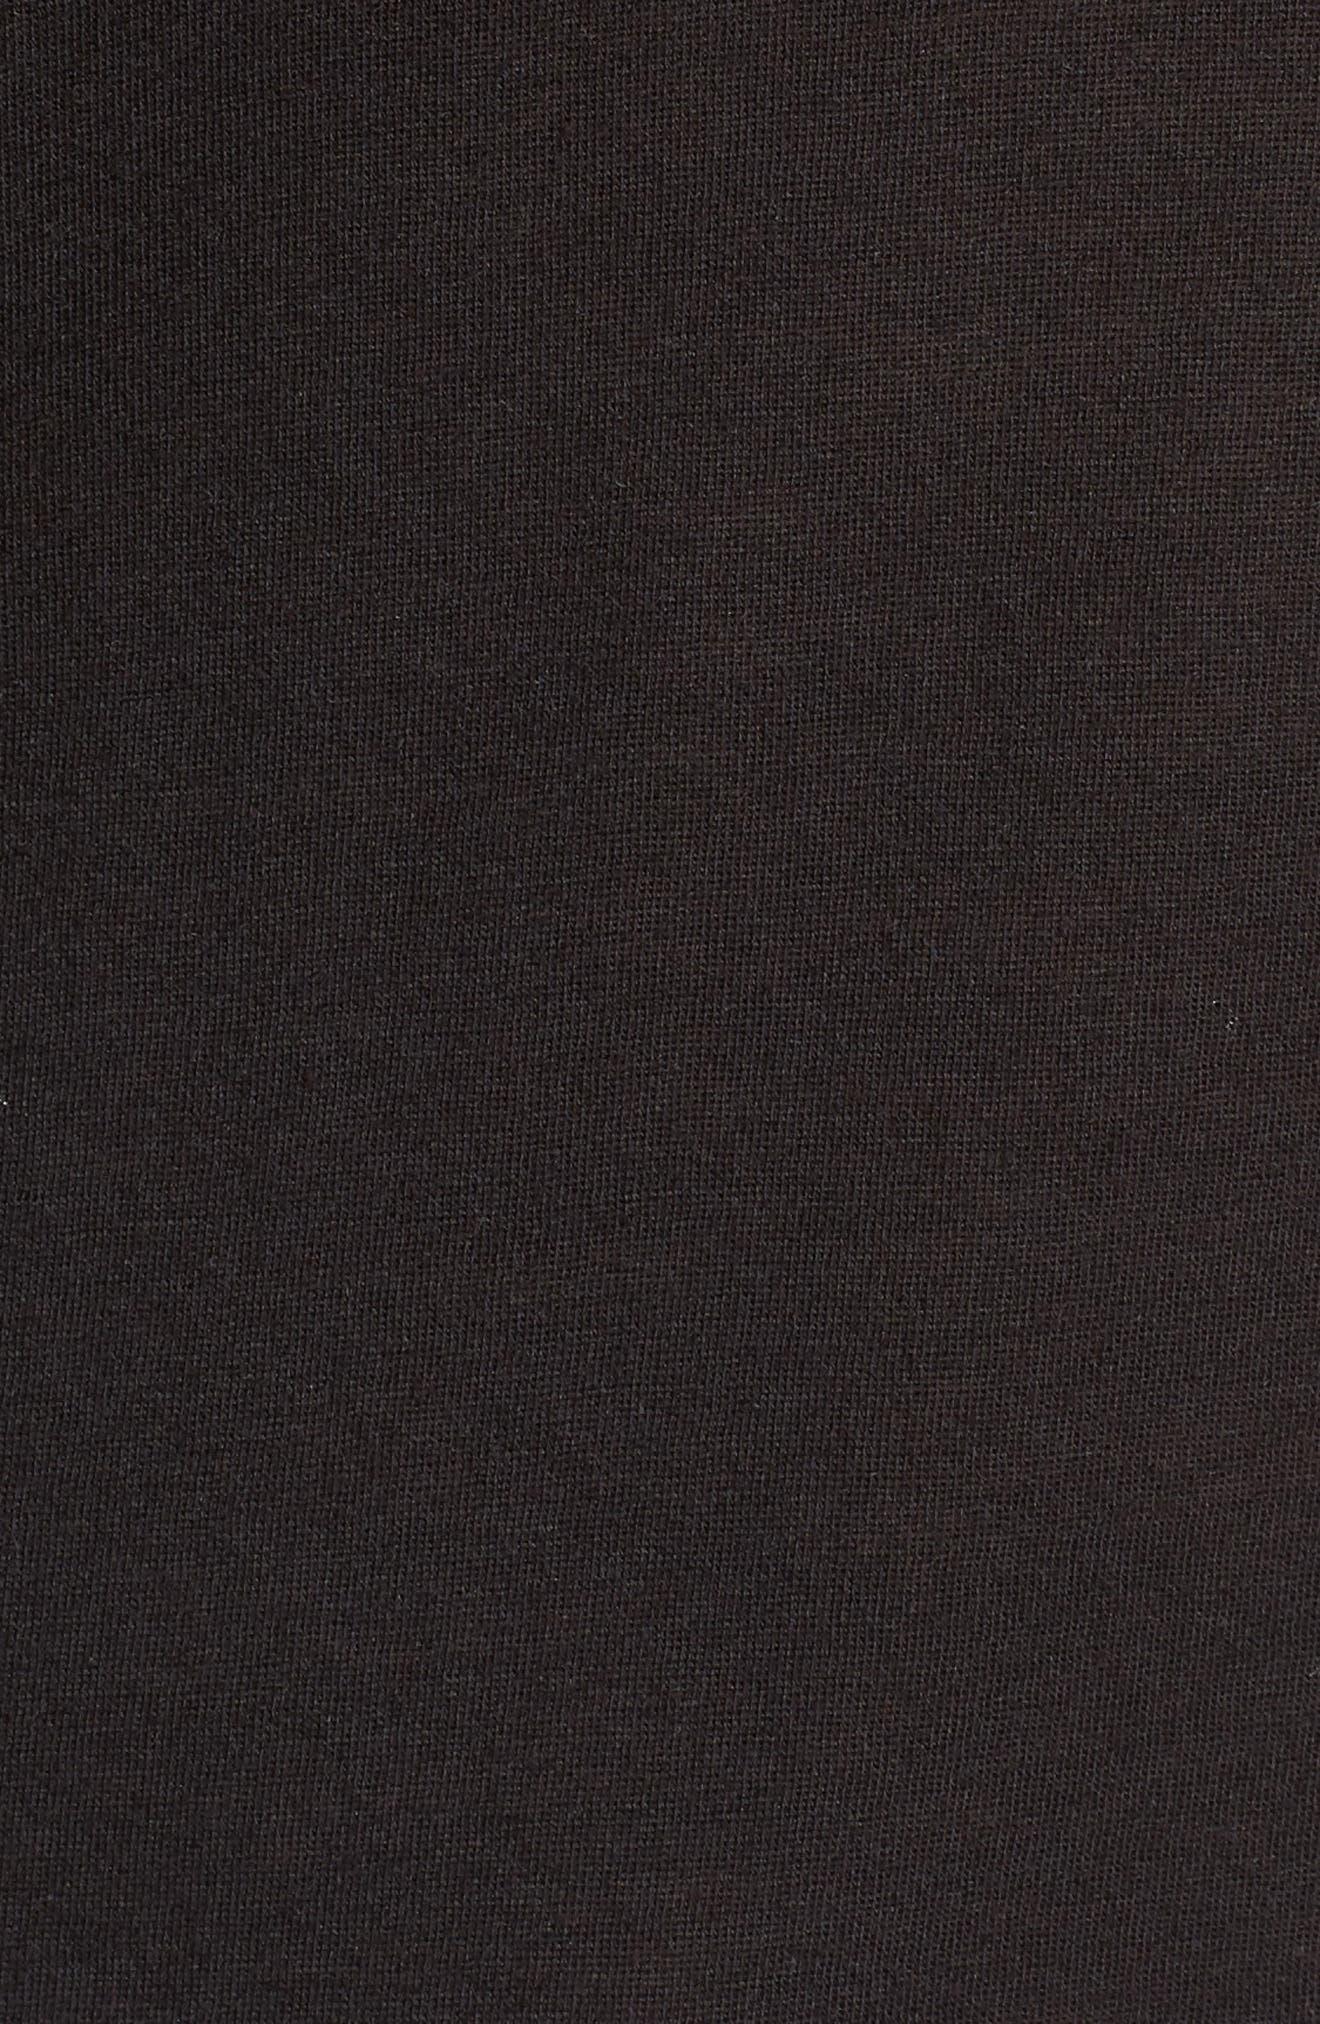 Reed Scoop Neck Tee,                             Alternate thumbnail 6, color,                             BLACK